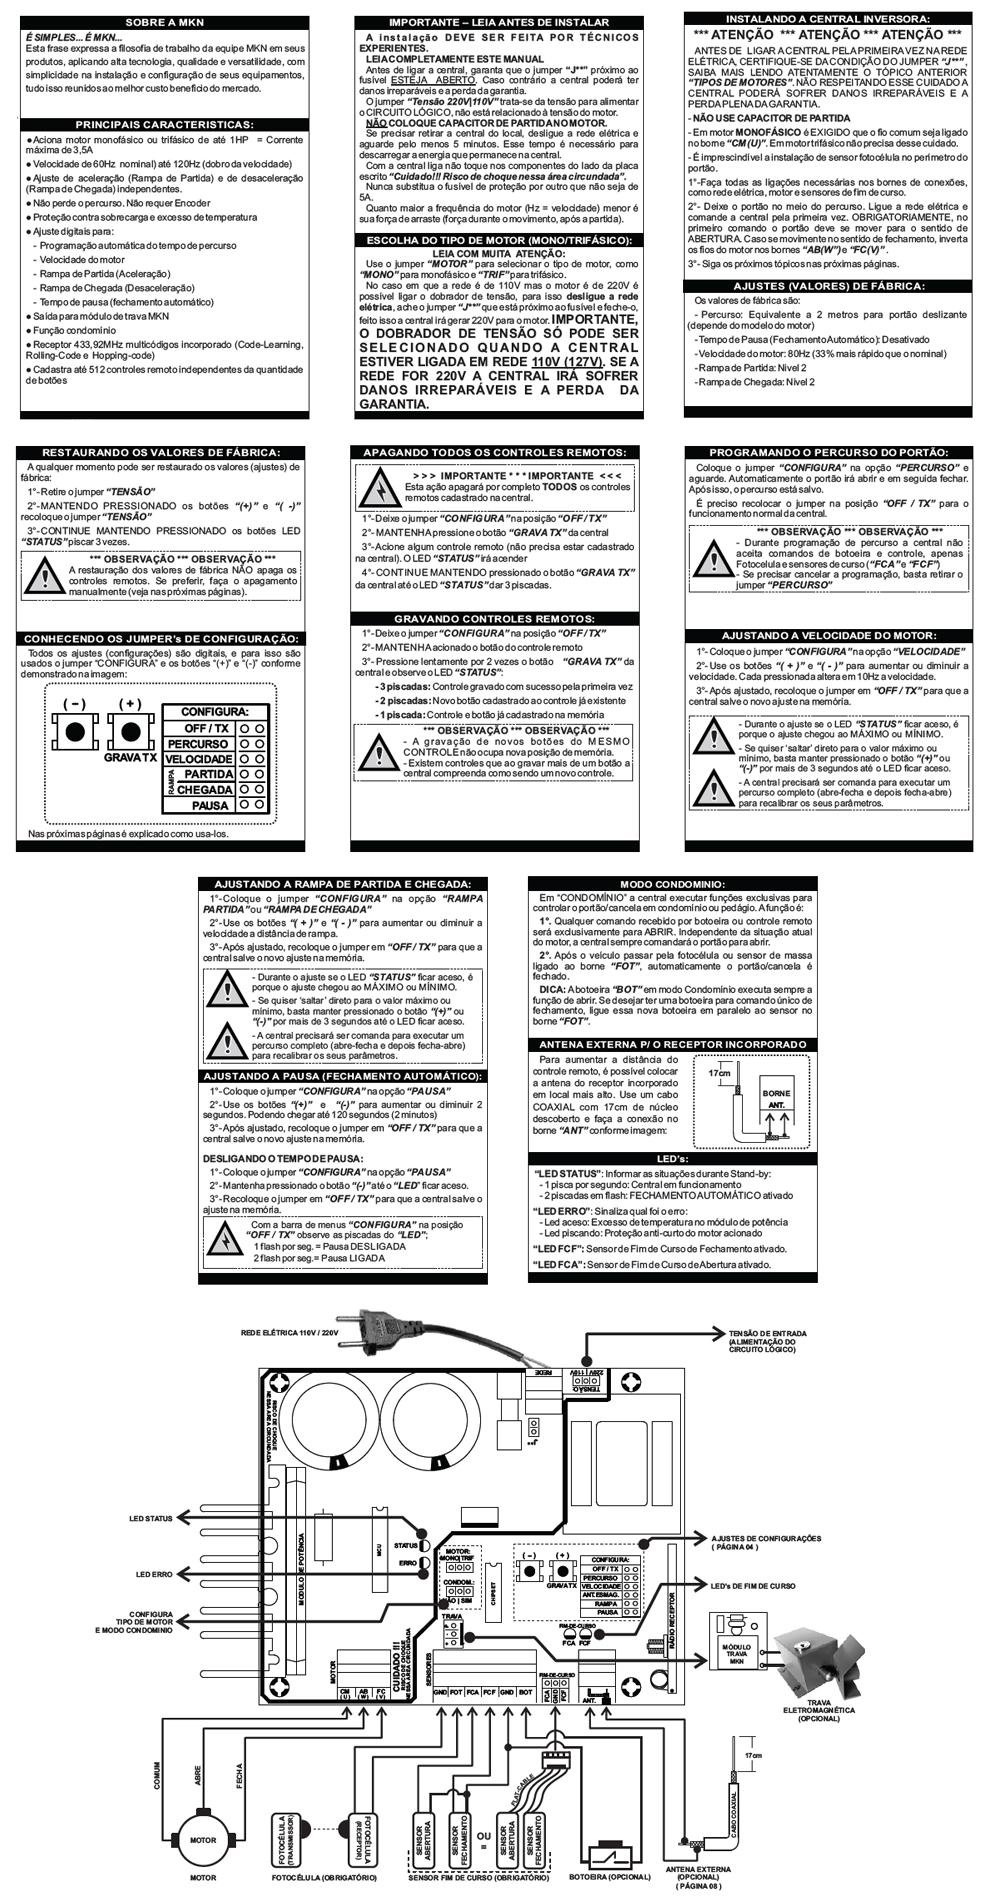 Manual central de alarme ecp alard max rf output system